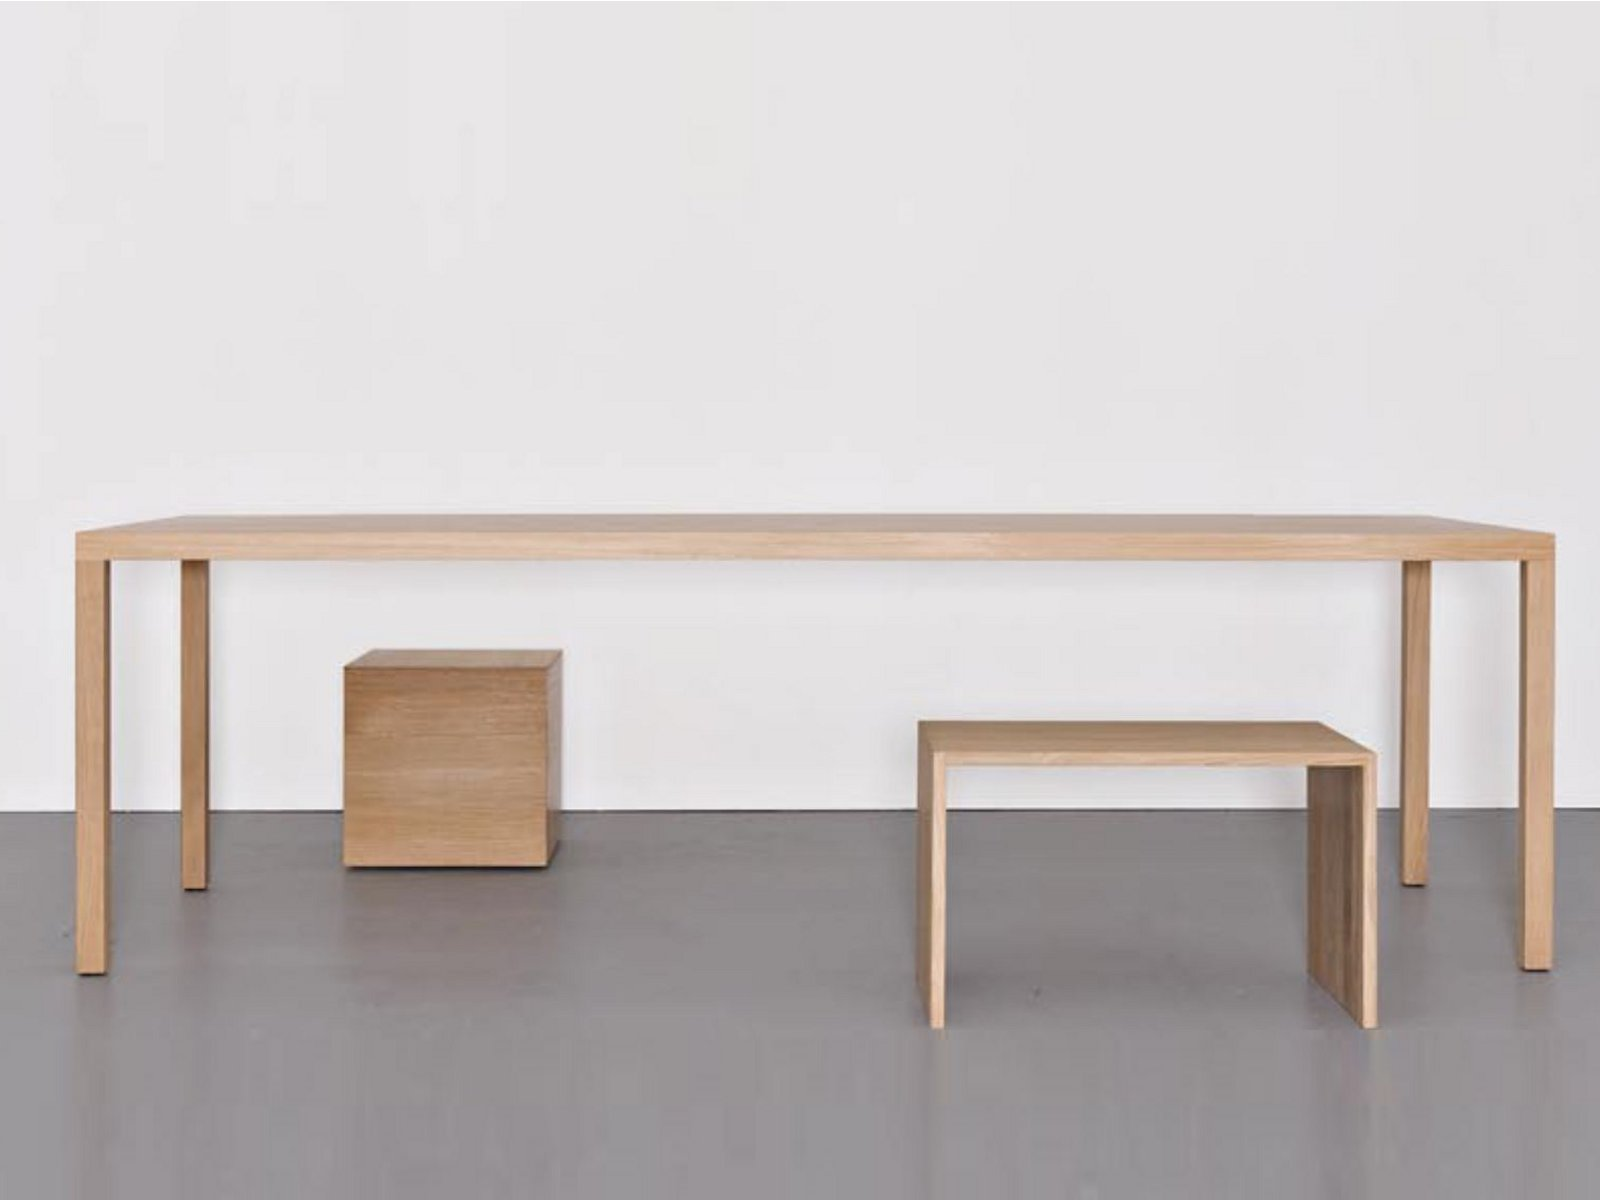 Mesa de madera maciza dinanull by sanktjohanser dise o matthias hubert sanktjohanser - Mesa madera diseno ...